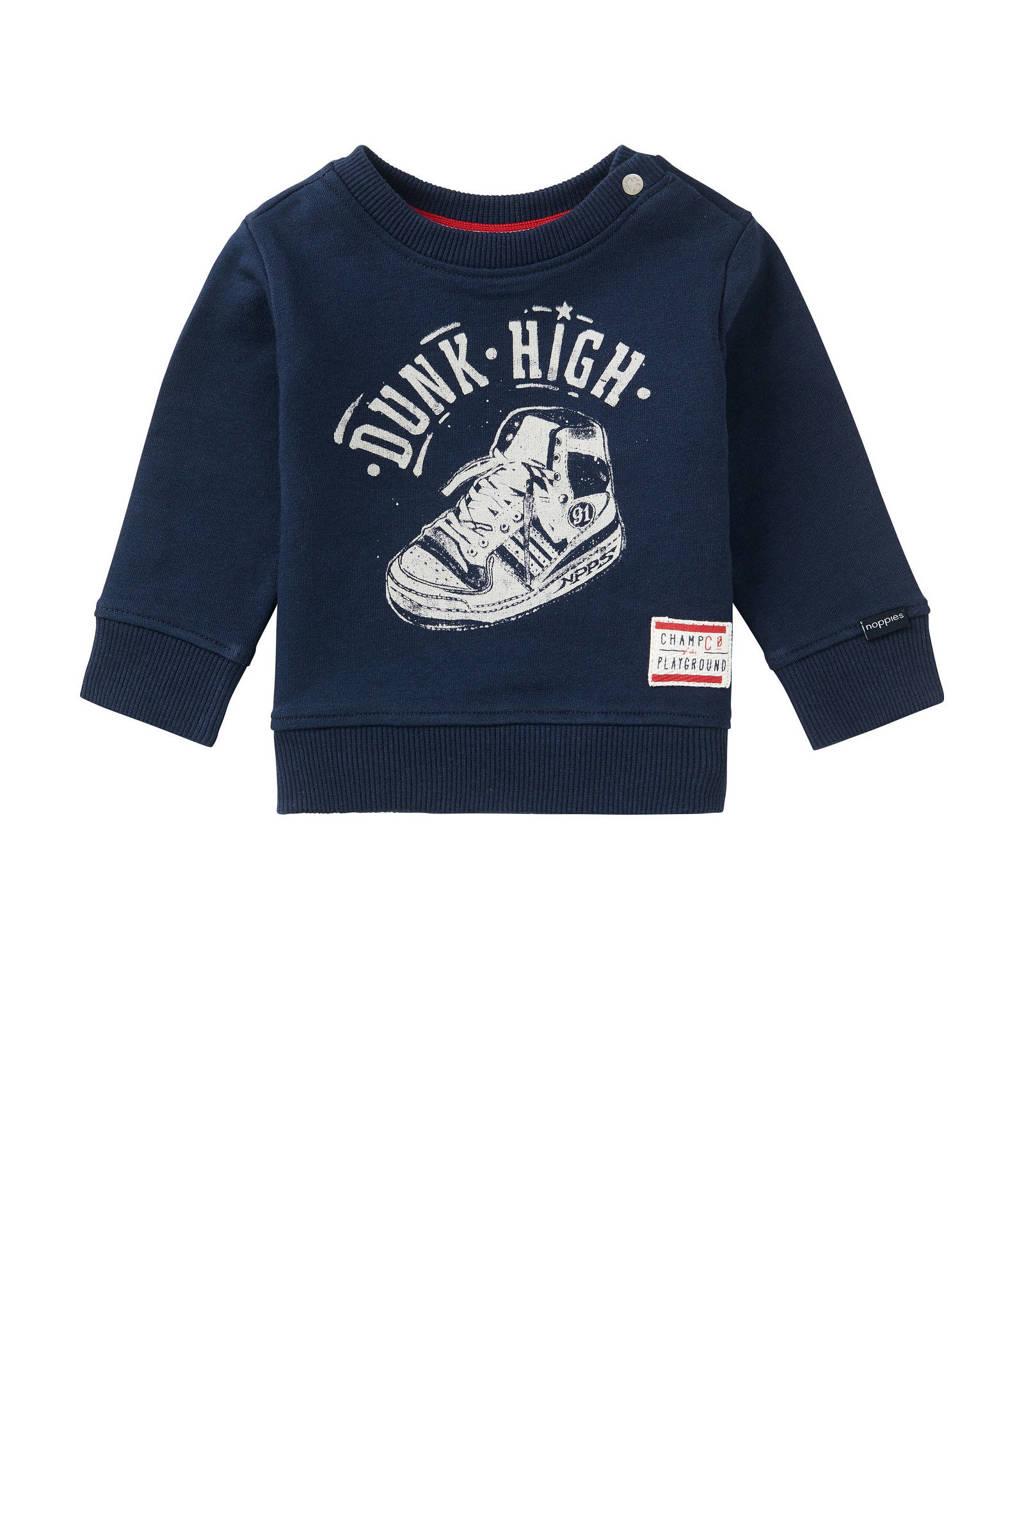 Noppies baby sweater Petoria met printopdruk donkerblauw/wit, Donkerblauw/wit